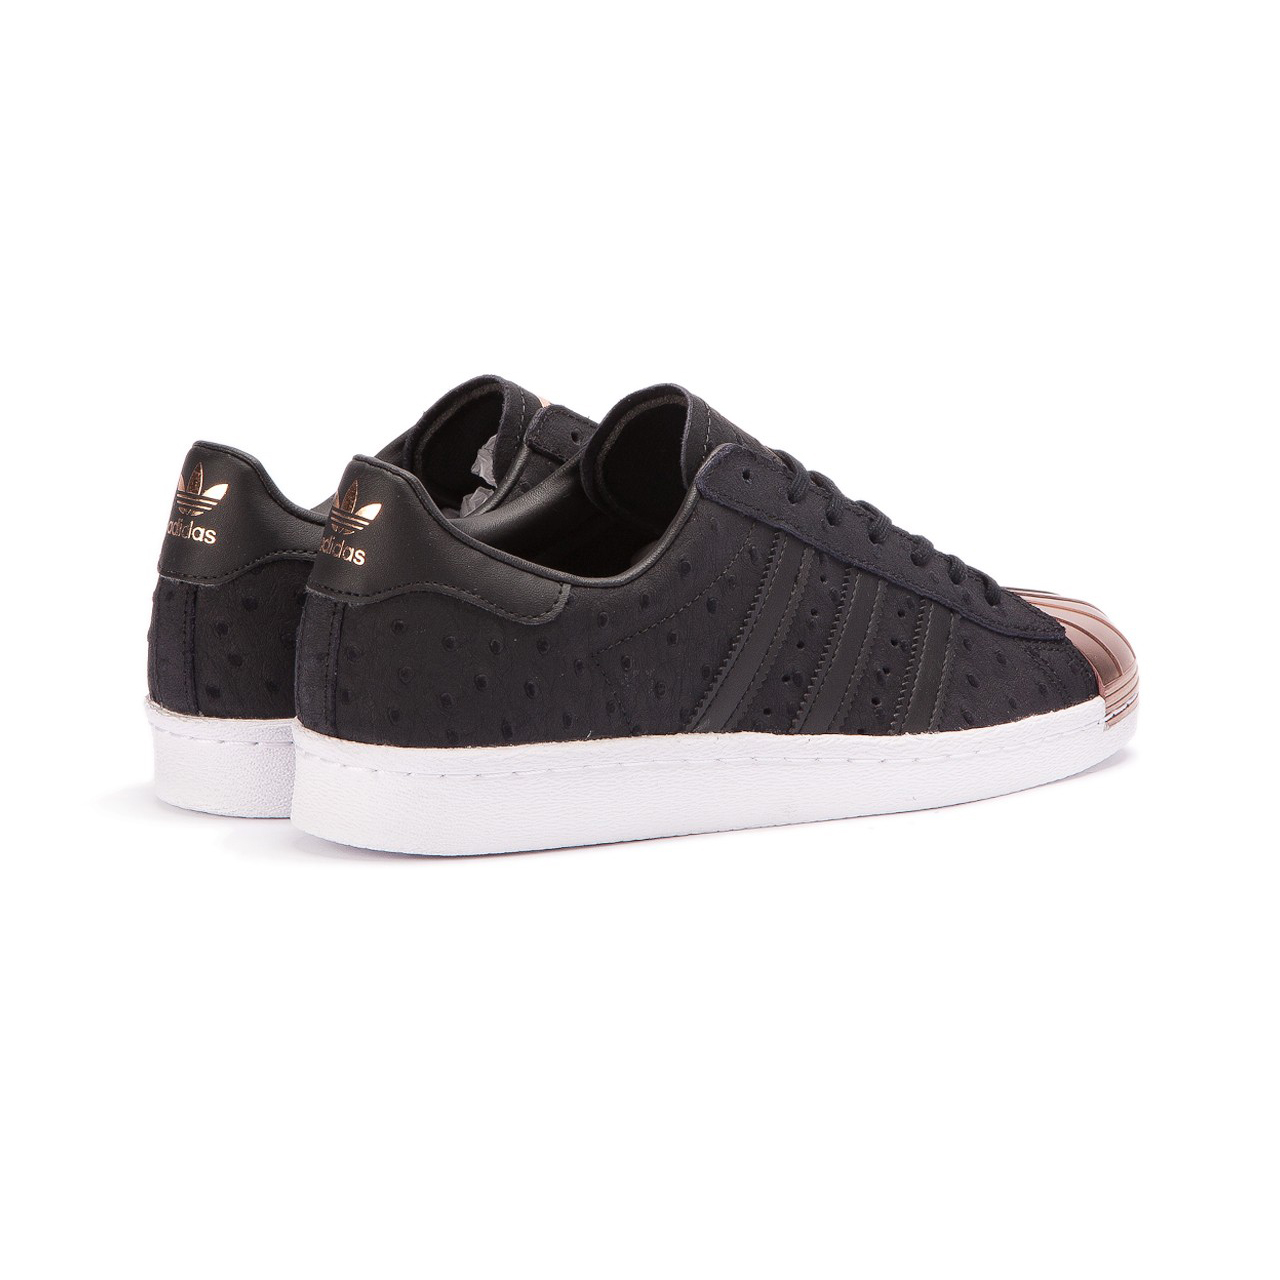 Adidas Superstar 80 Originales Zapatos De Punta De Metal Núcleo Negro INobCIQ